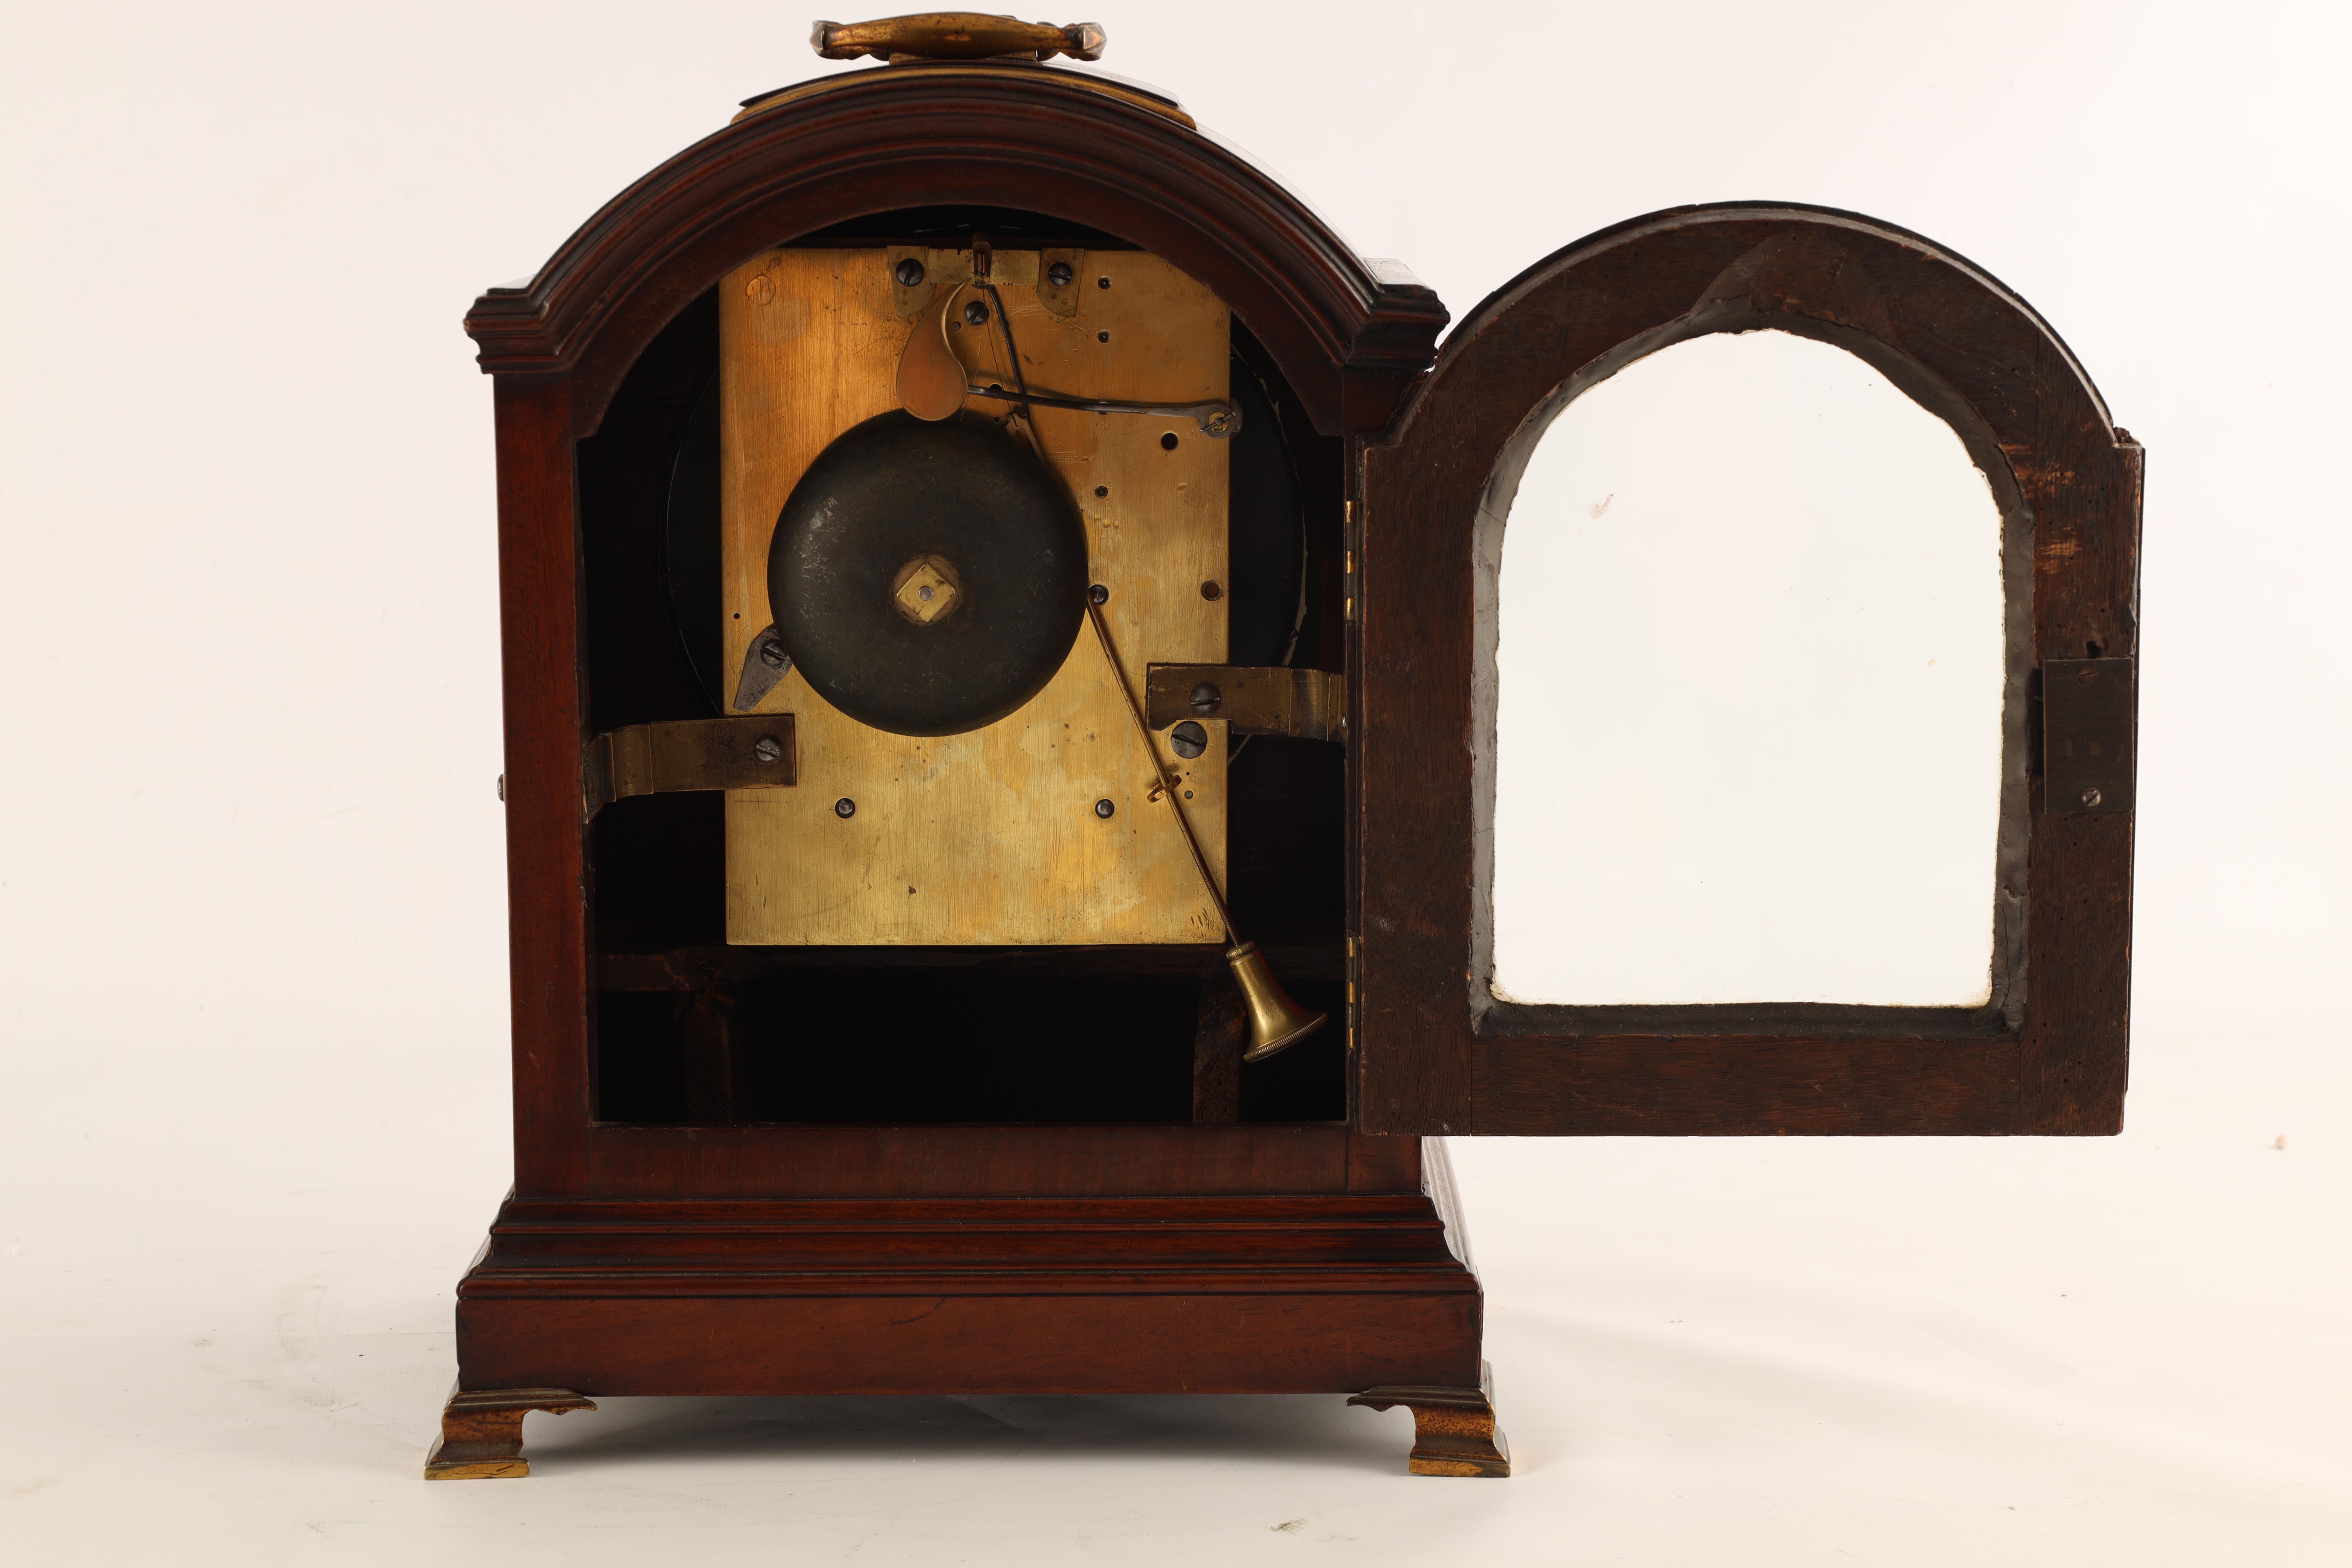 JOHN DOBBS, LONDON A LATE GEORGE III MAHOGANY VERGE BRACKET CLOCK the figured mahogany case with - Image 6 of 8